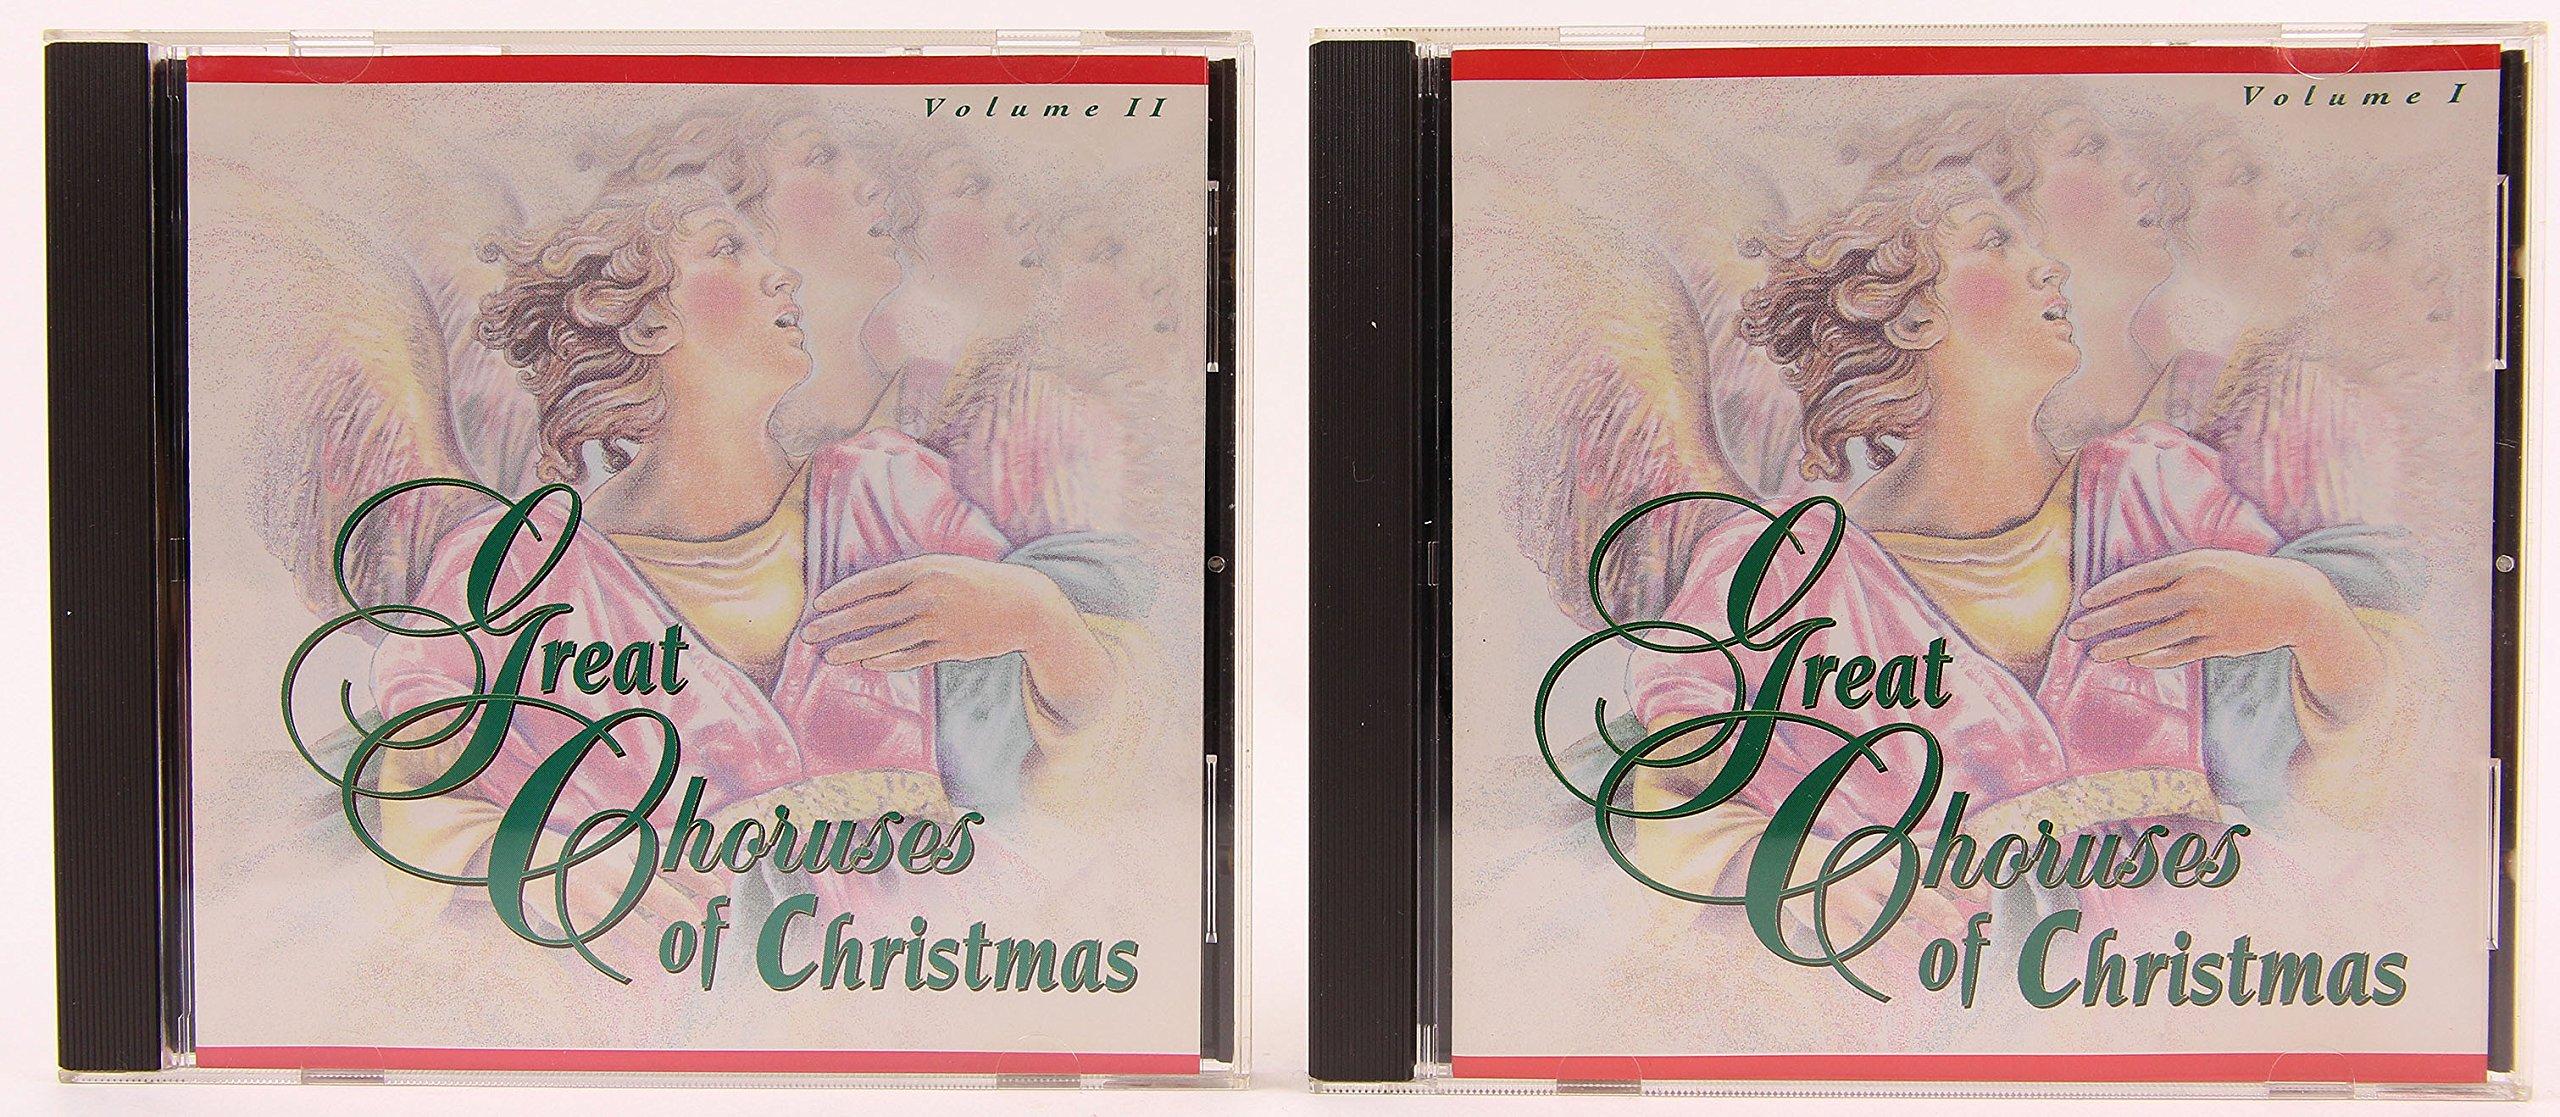 Great Choruses of Christmas Volume I and II ~ 2-CD Set by